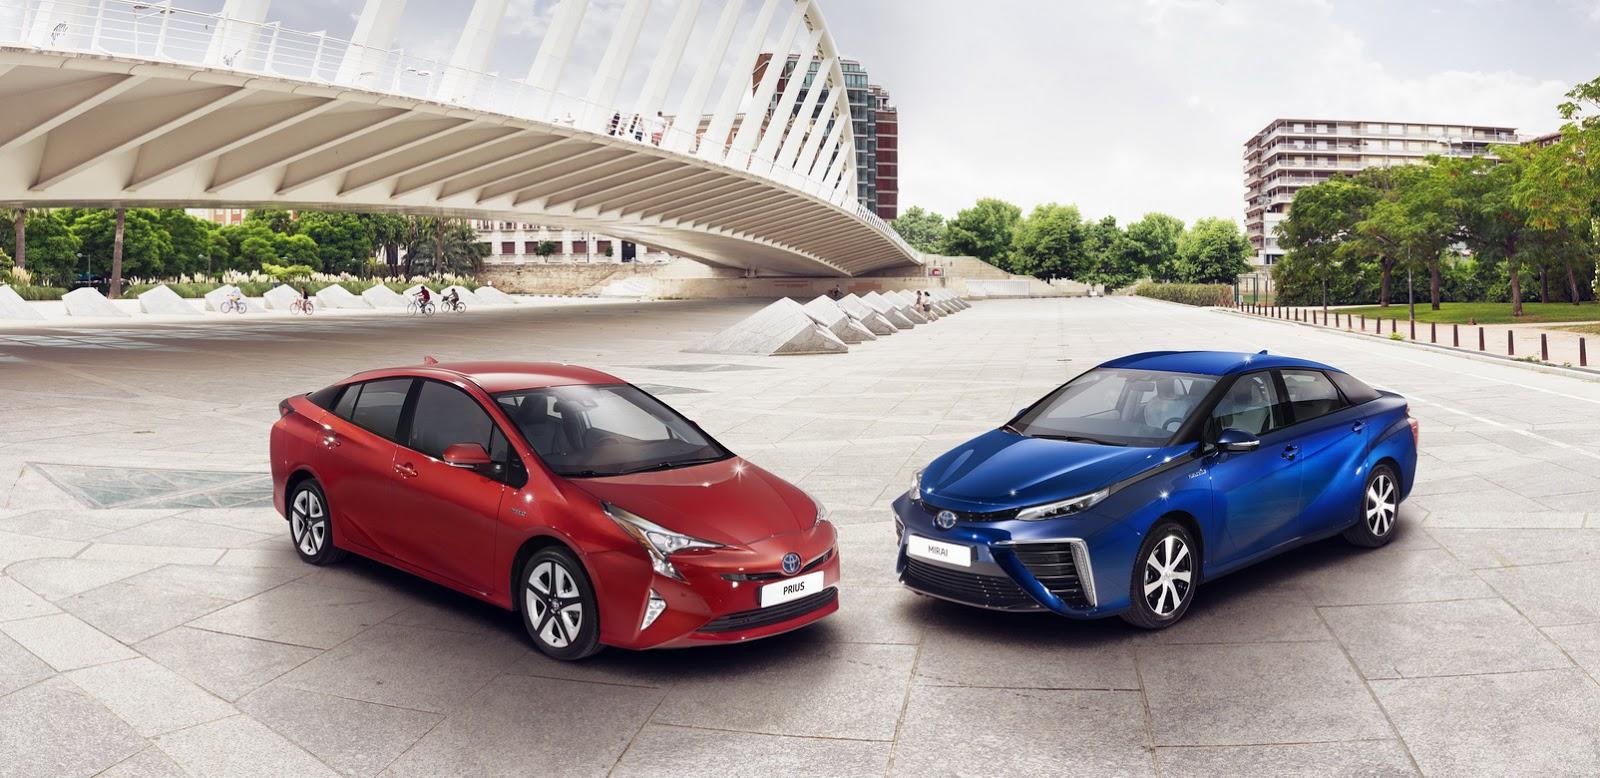 Nuova-Toyota-Prius-2016-12